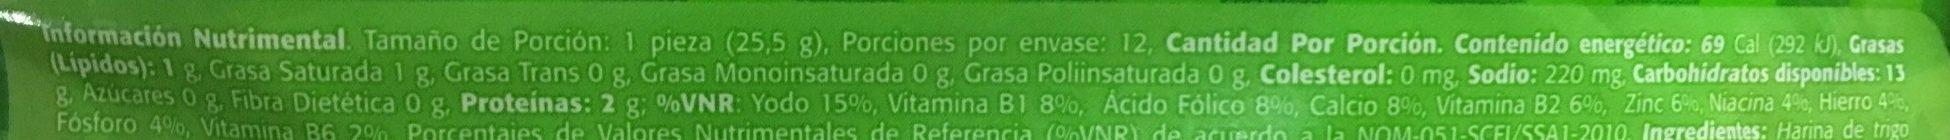 Tortillinas Ligeras - Informations nutritionnelles - es